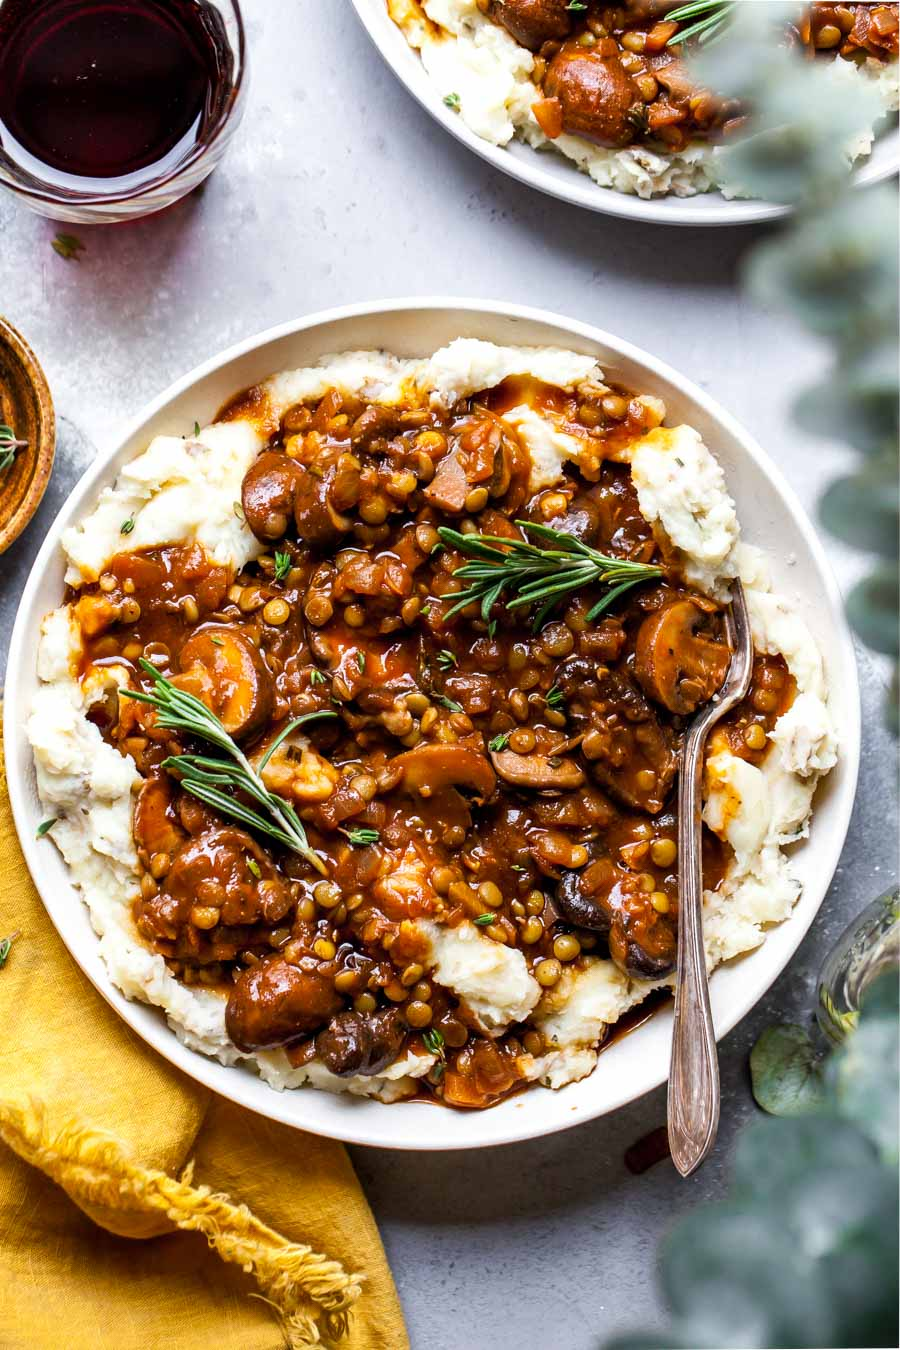 easy camping meals - lentil/mushroom stew